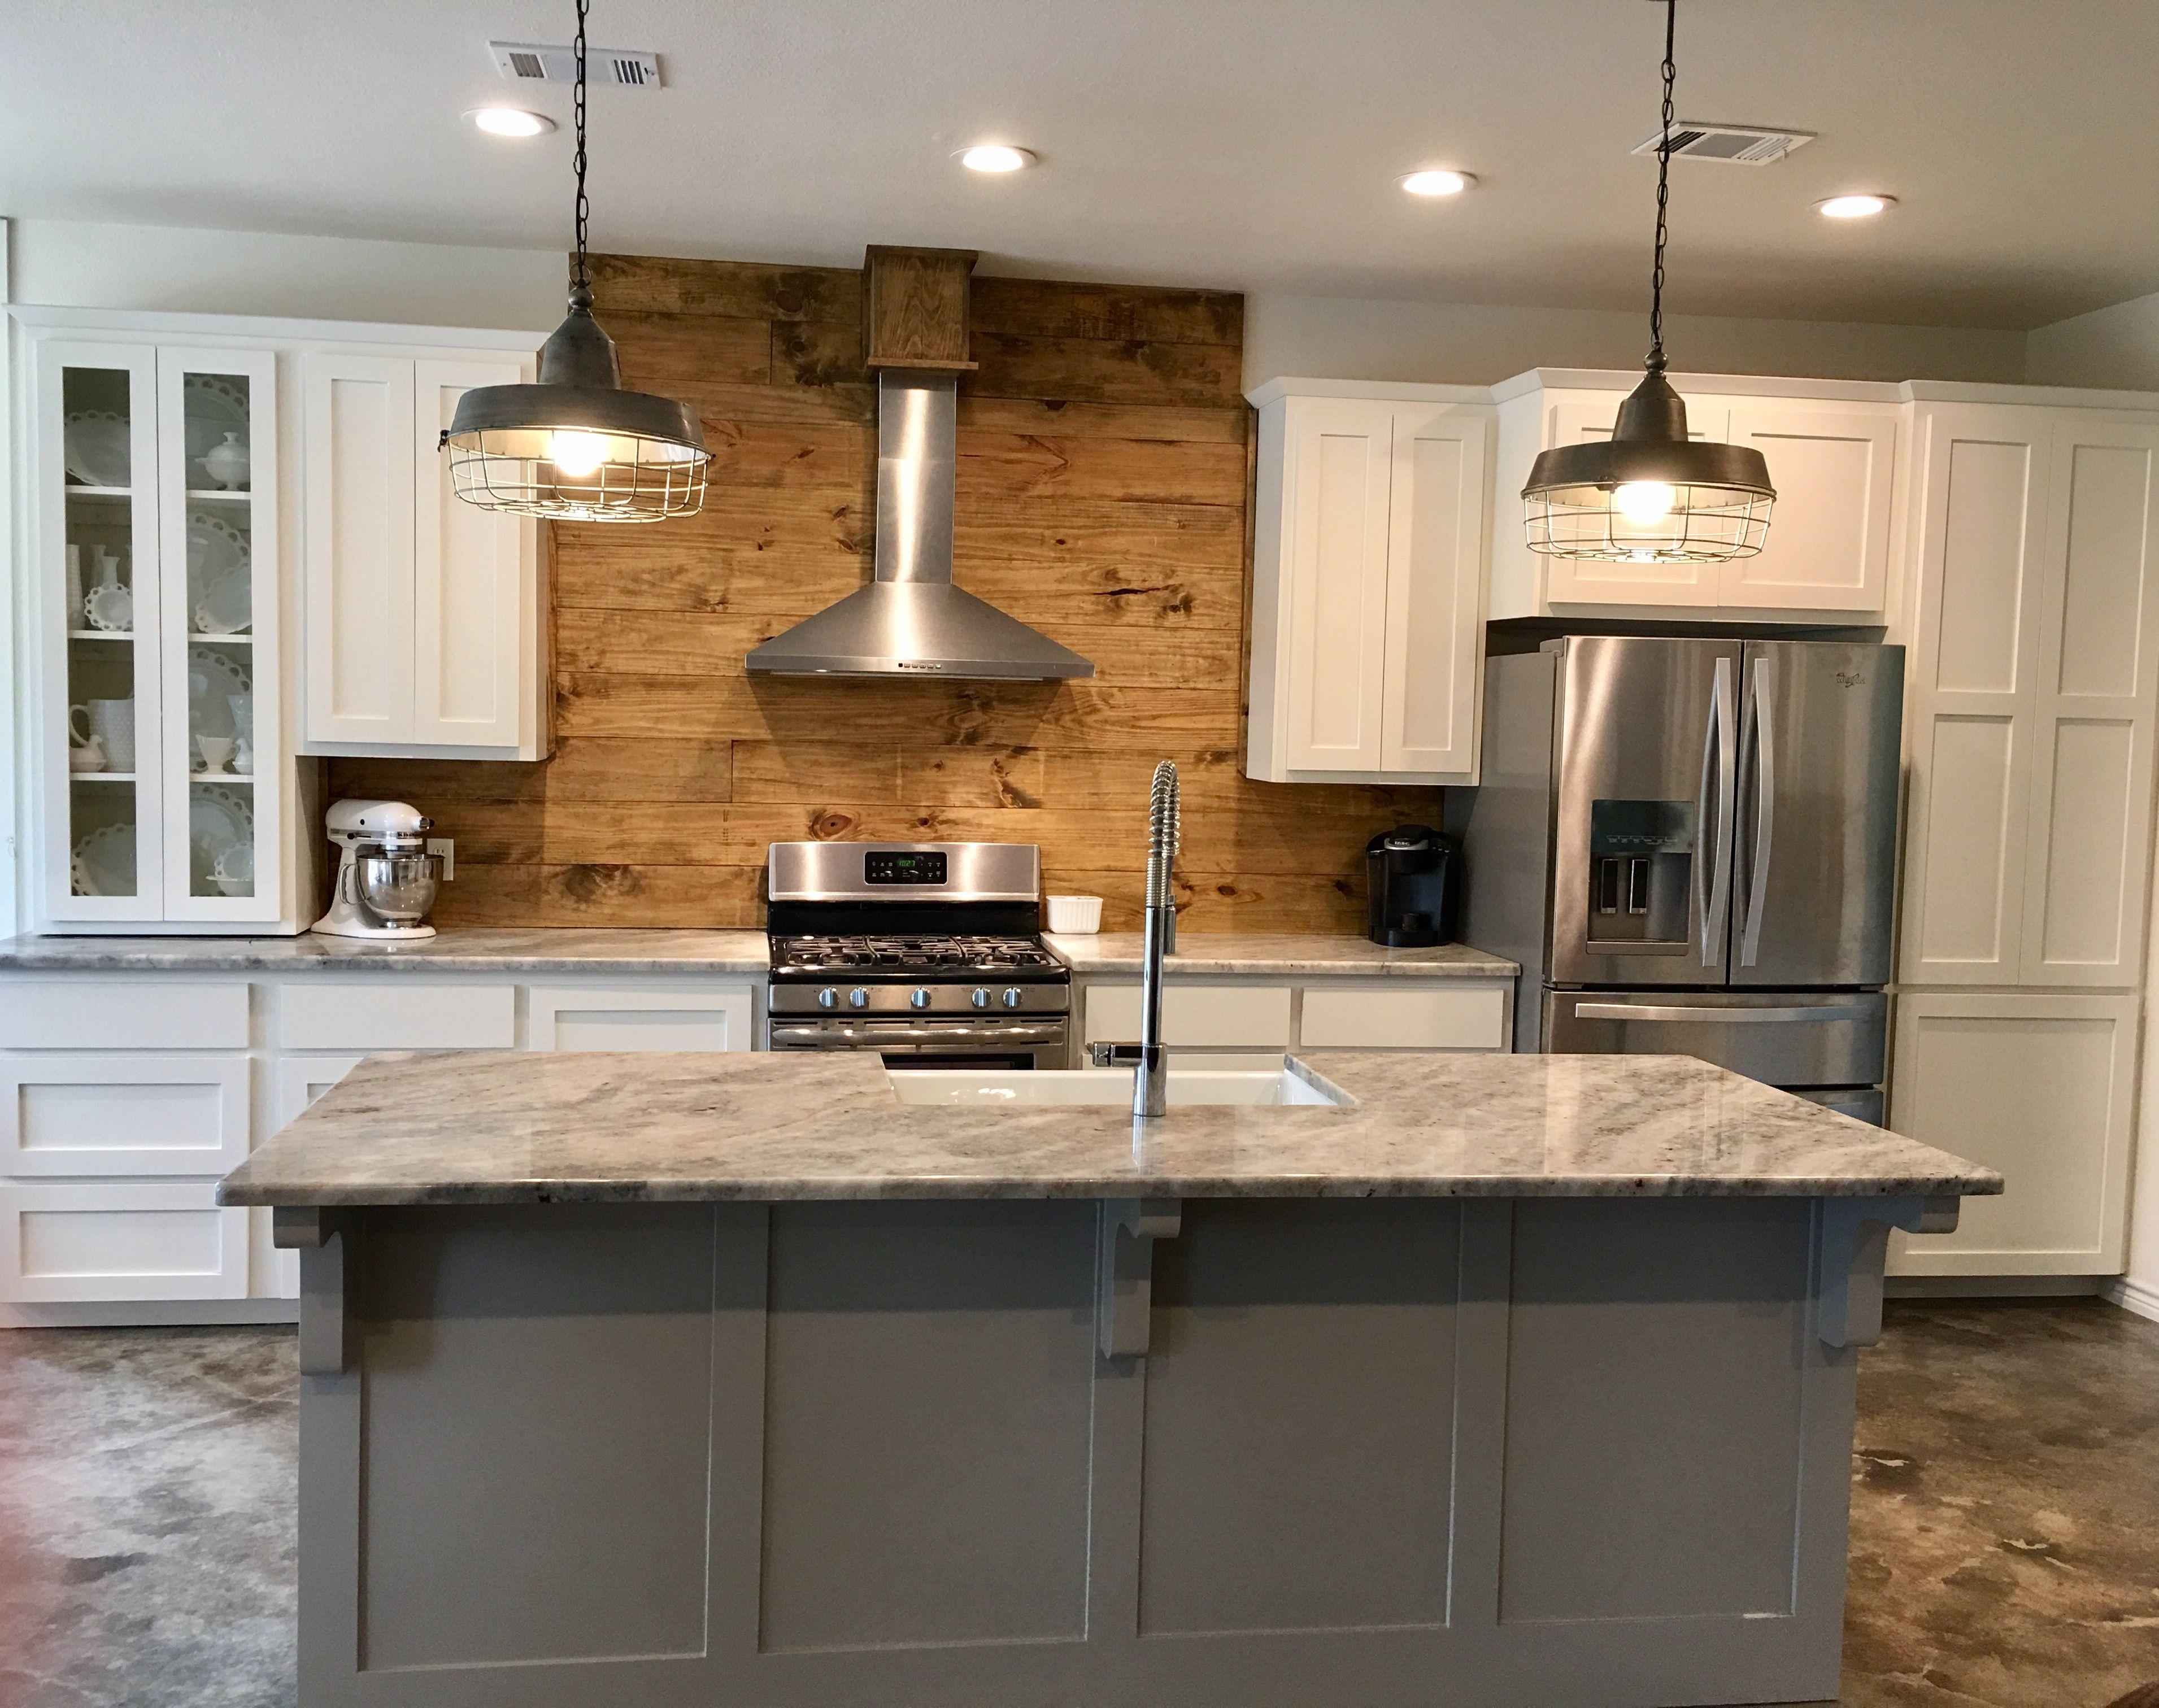 Stone Creek by Mitch Ginn: Industrial farmhouse kitchen